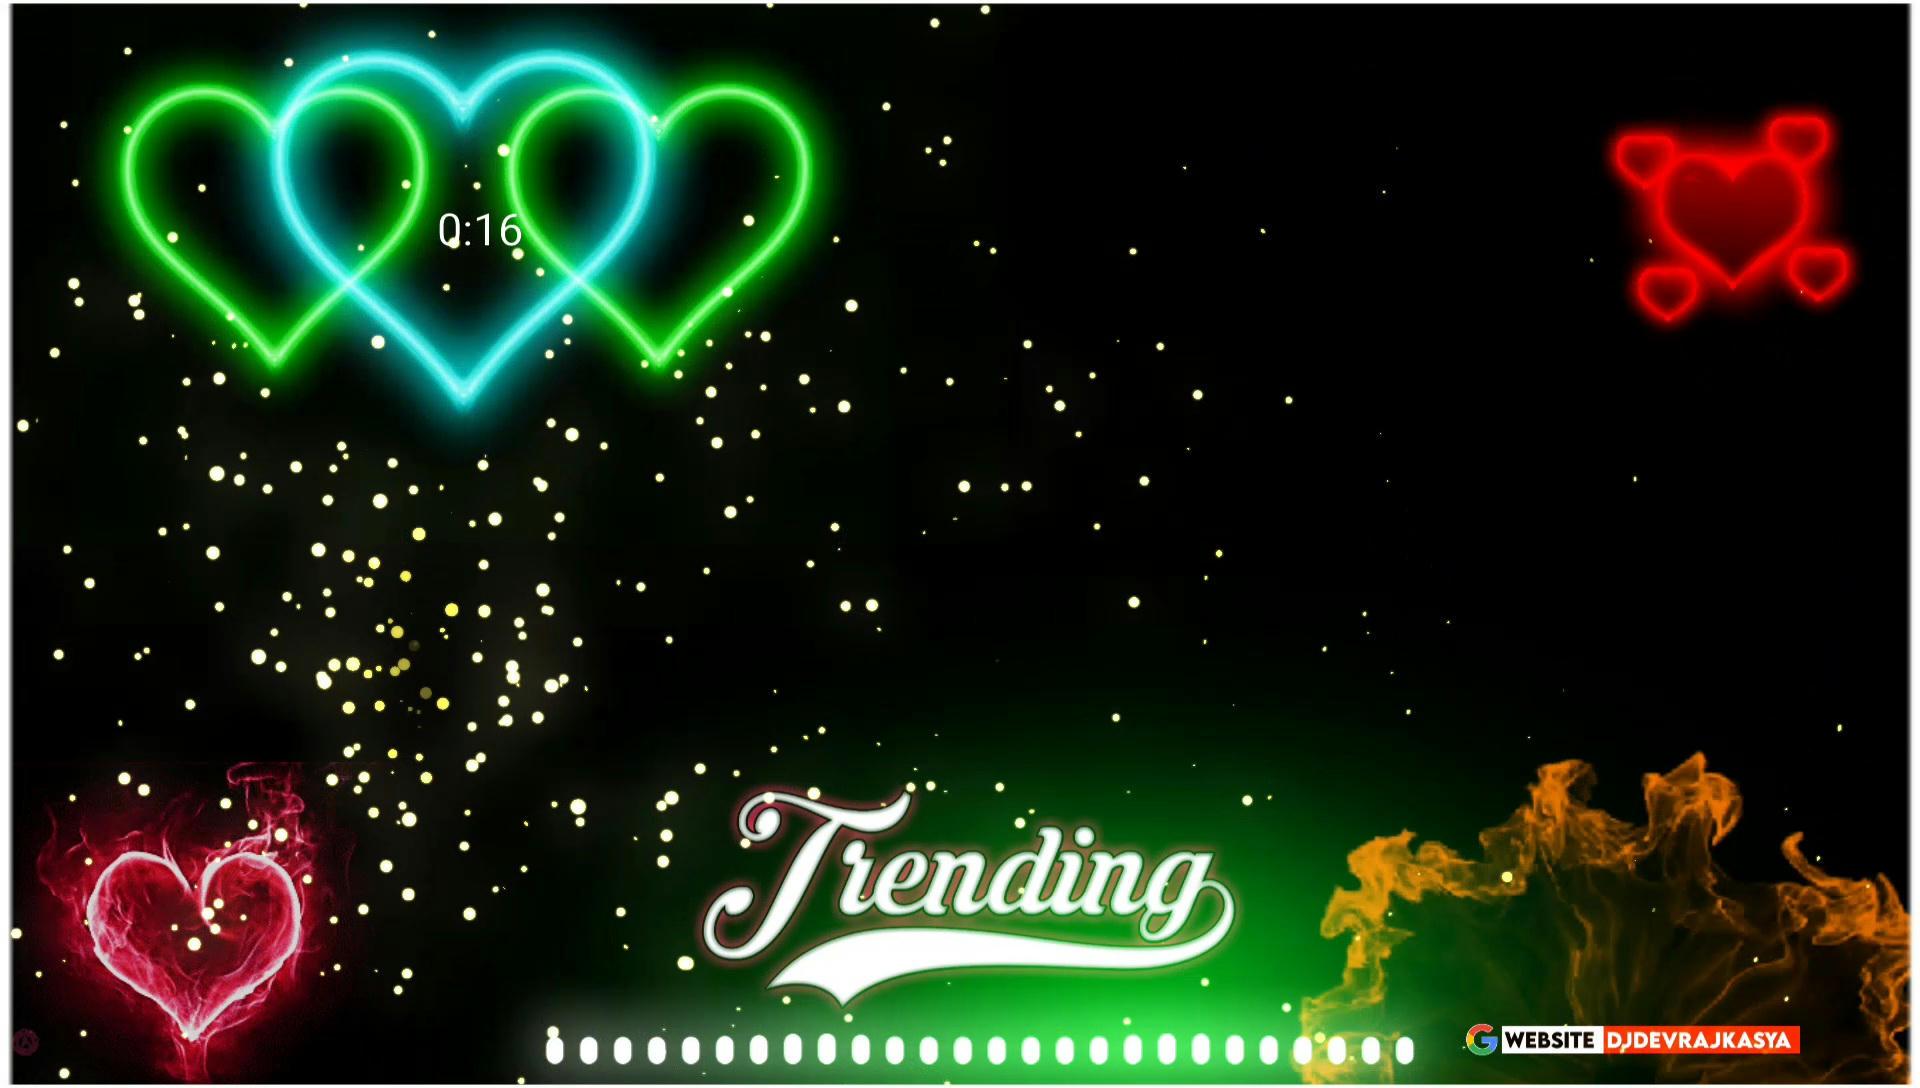 Trending Stylish Dj Remix Avee Player Template Download 2021